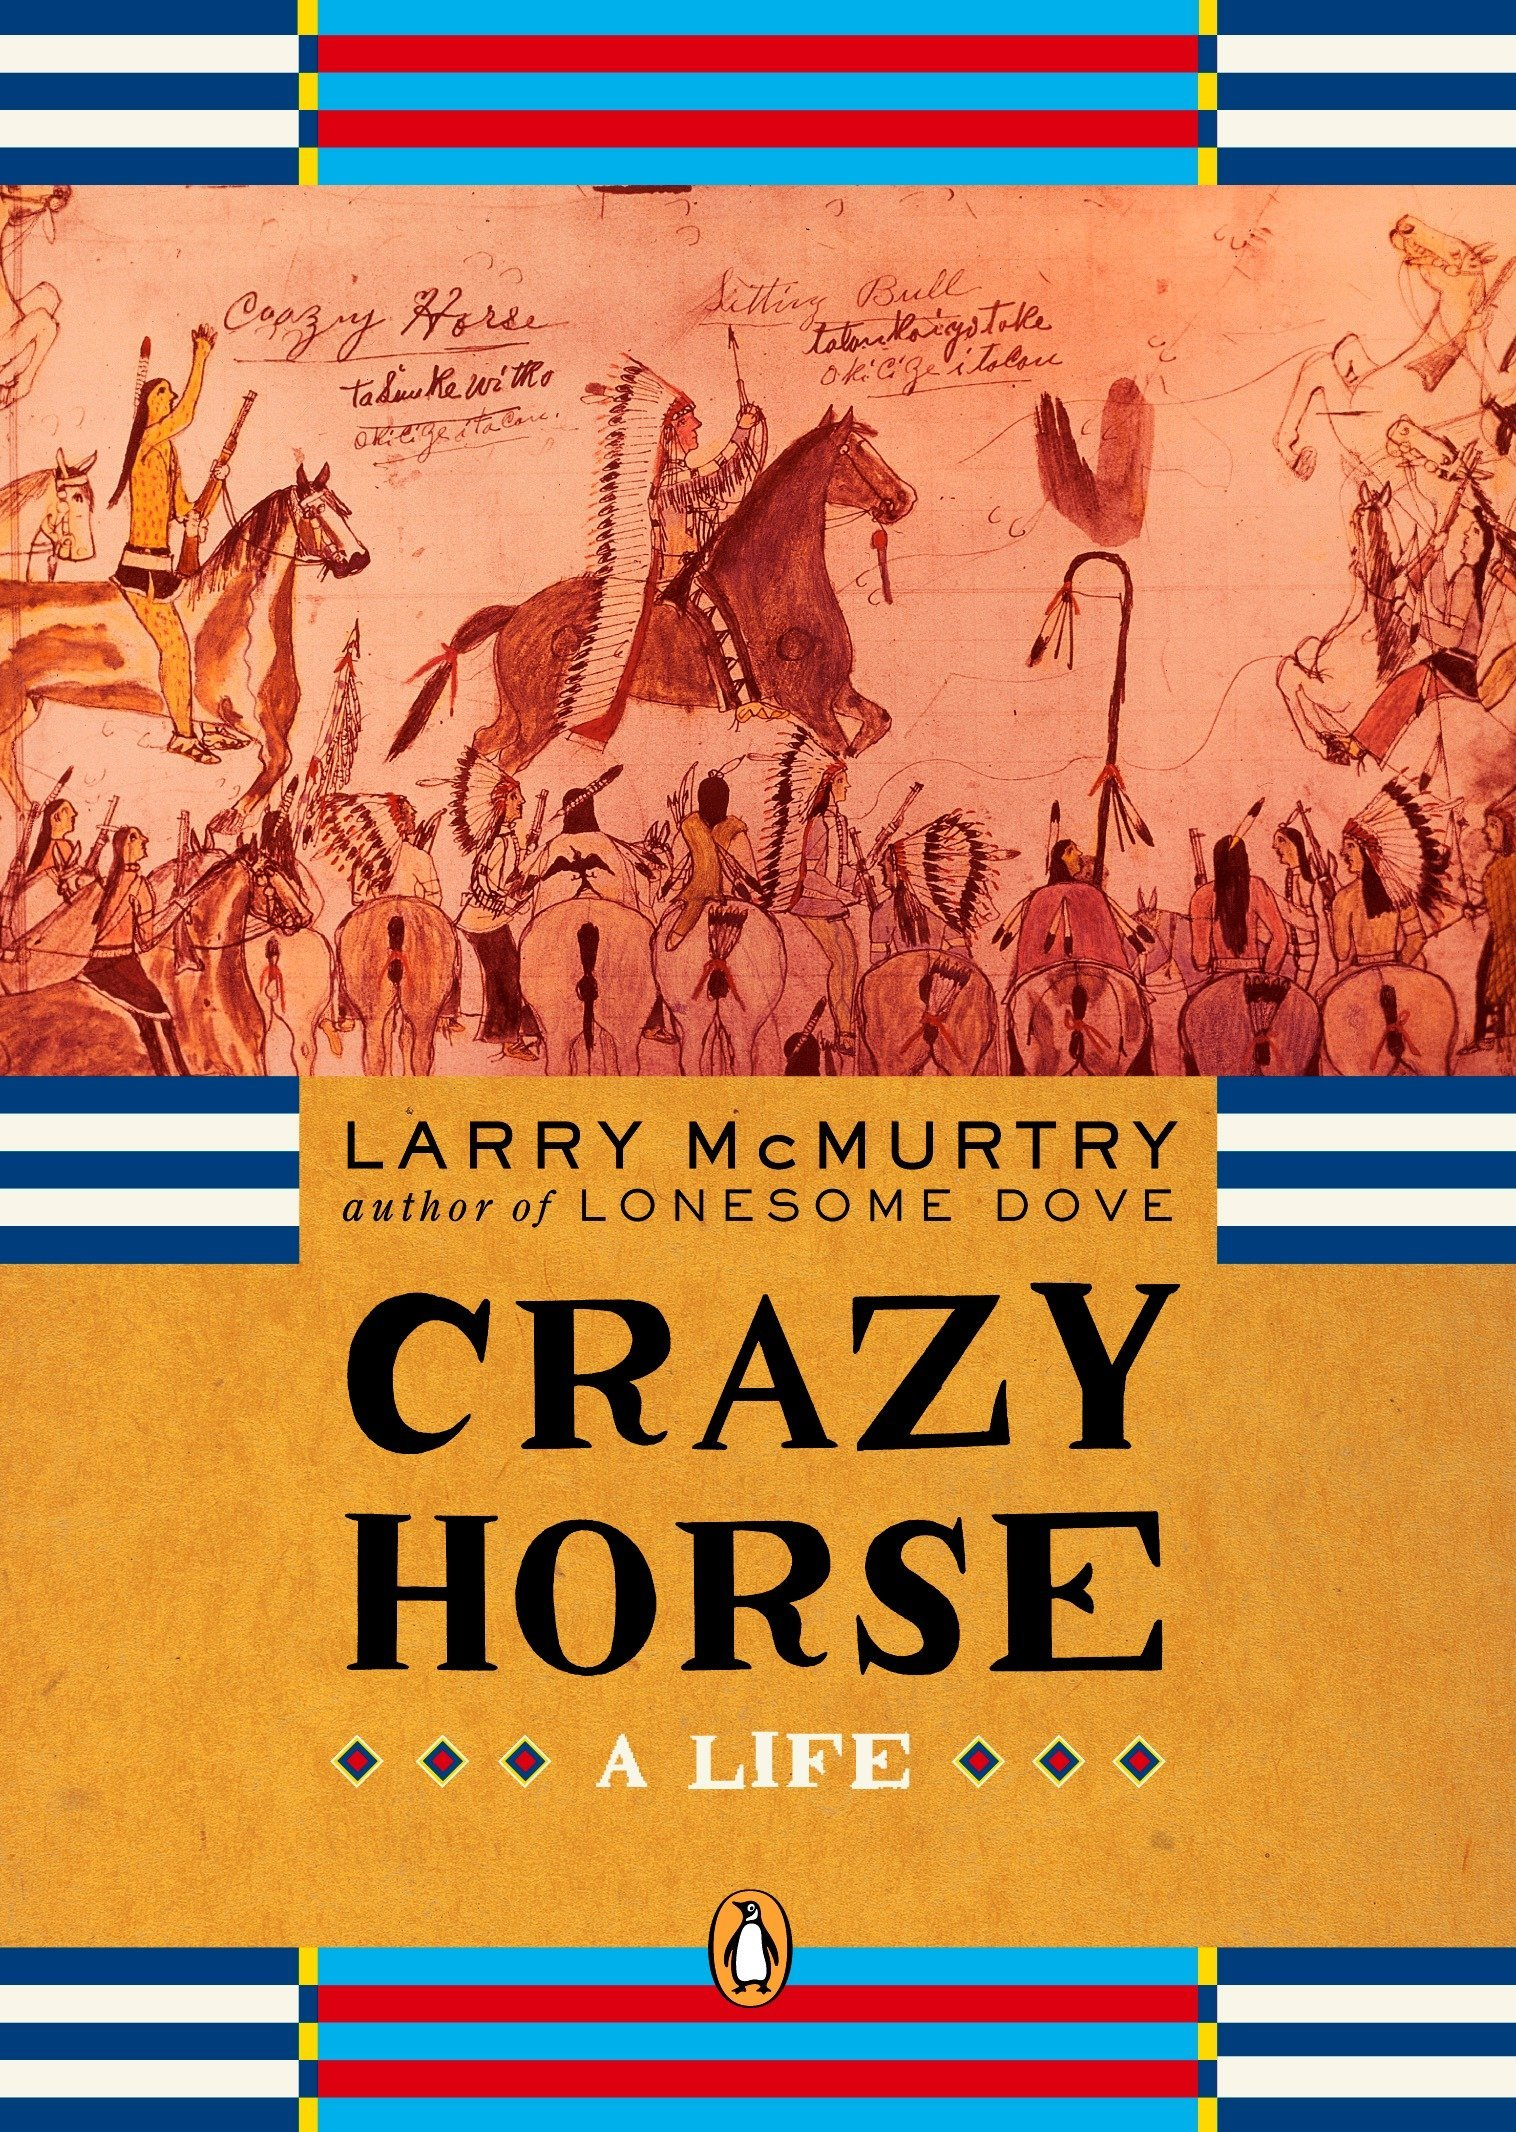 Crazy horse literary prizes